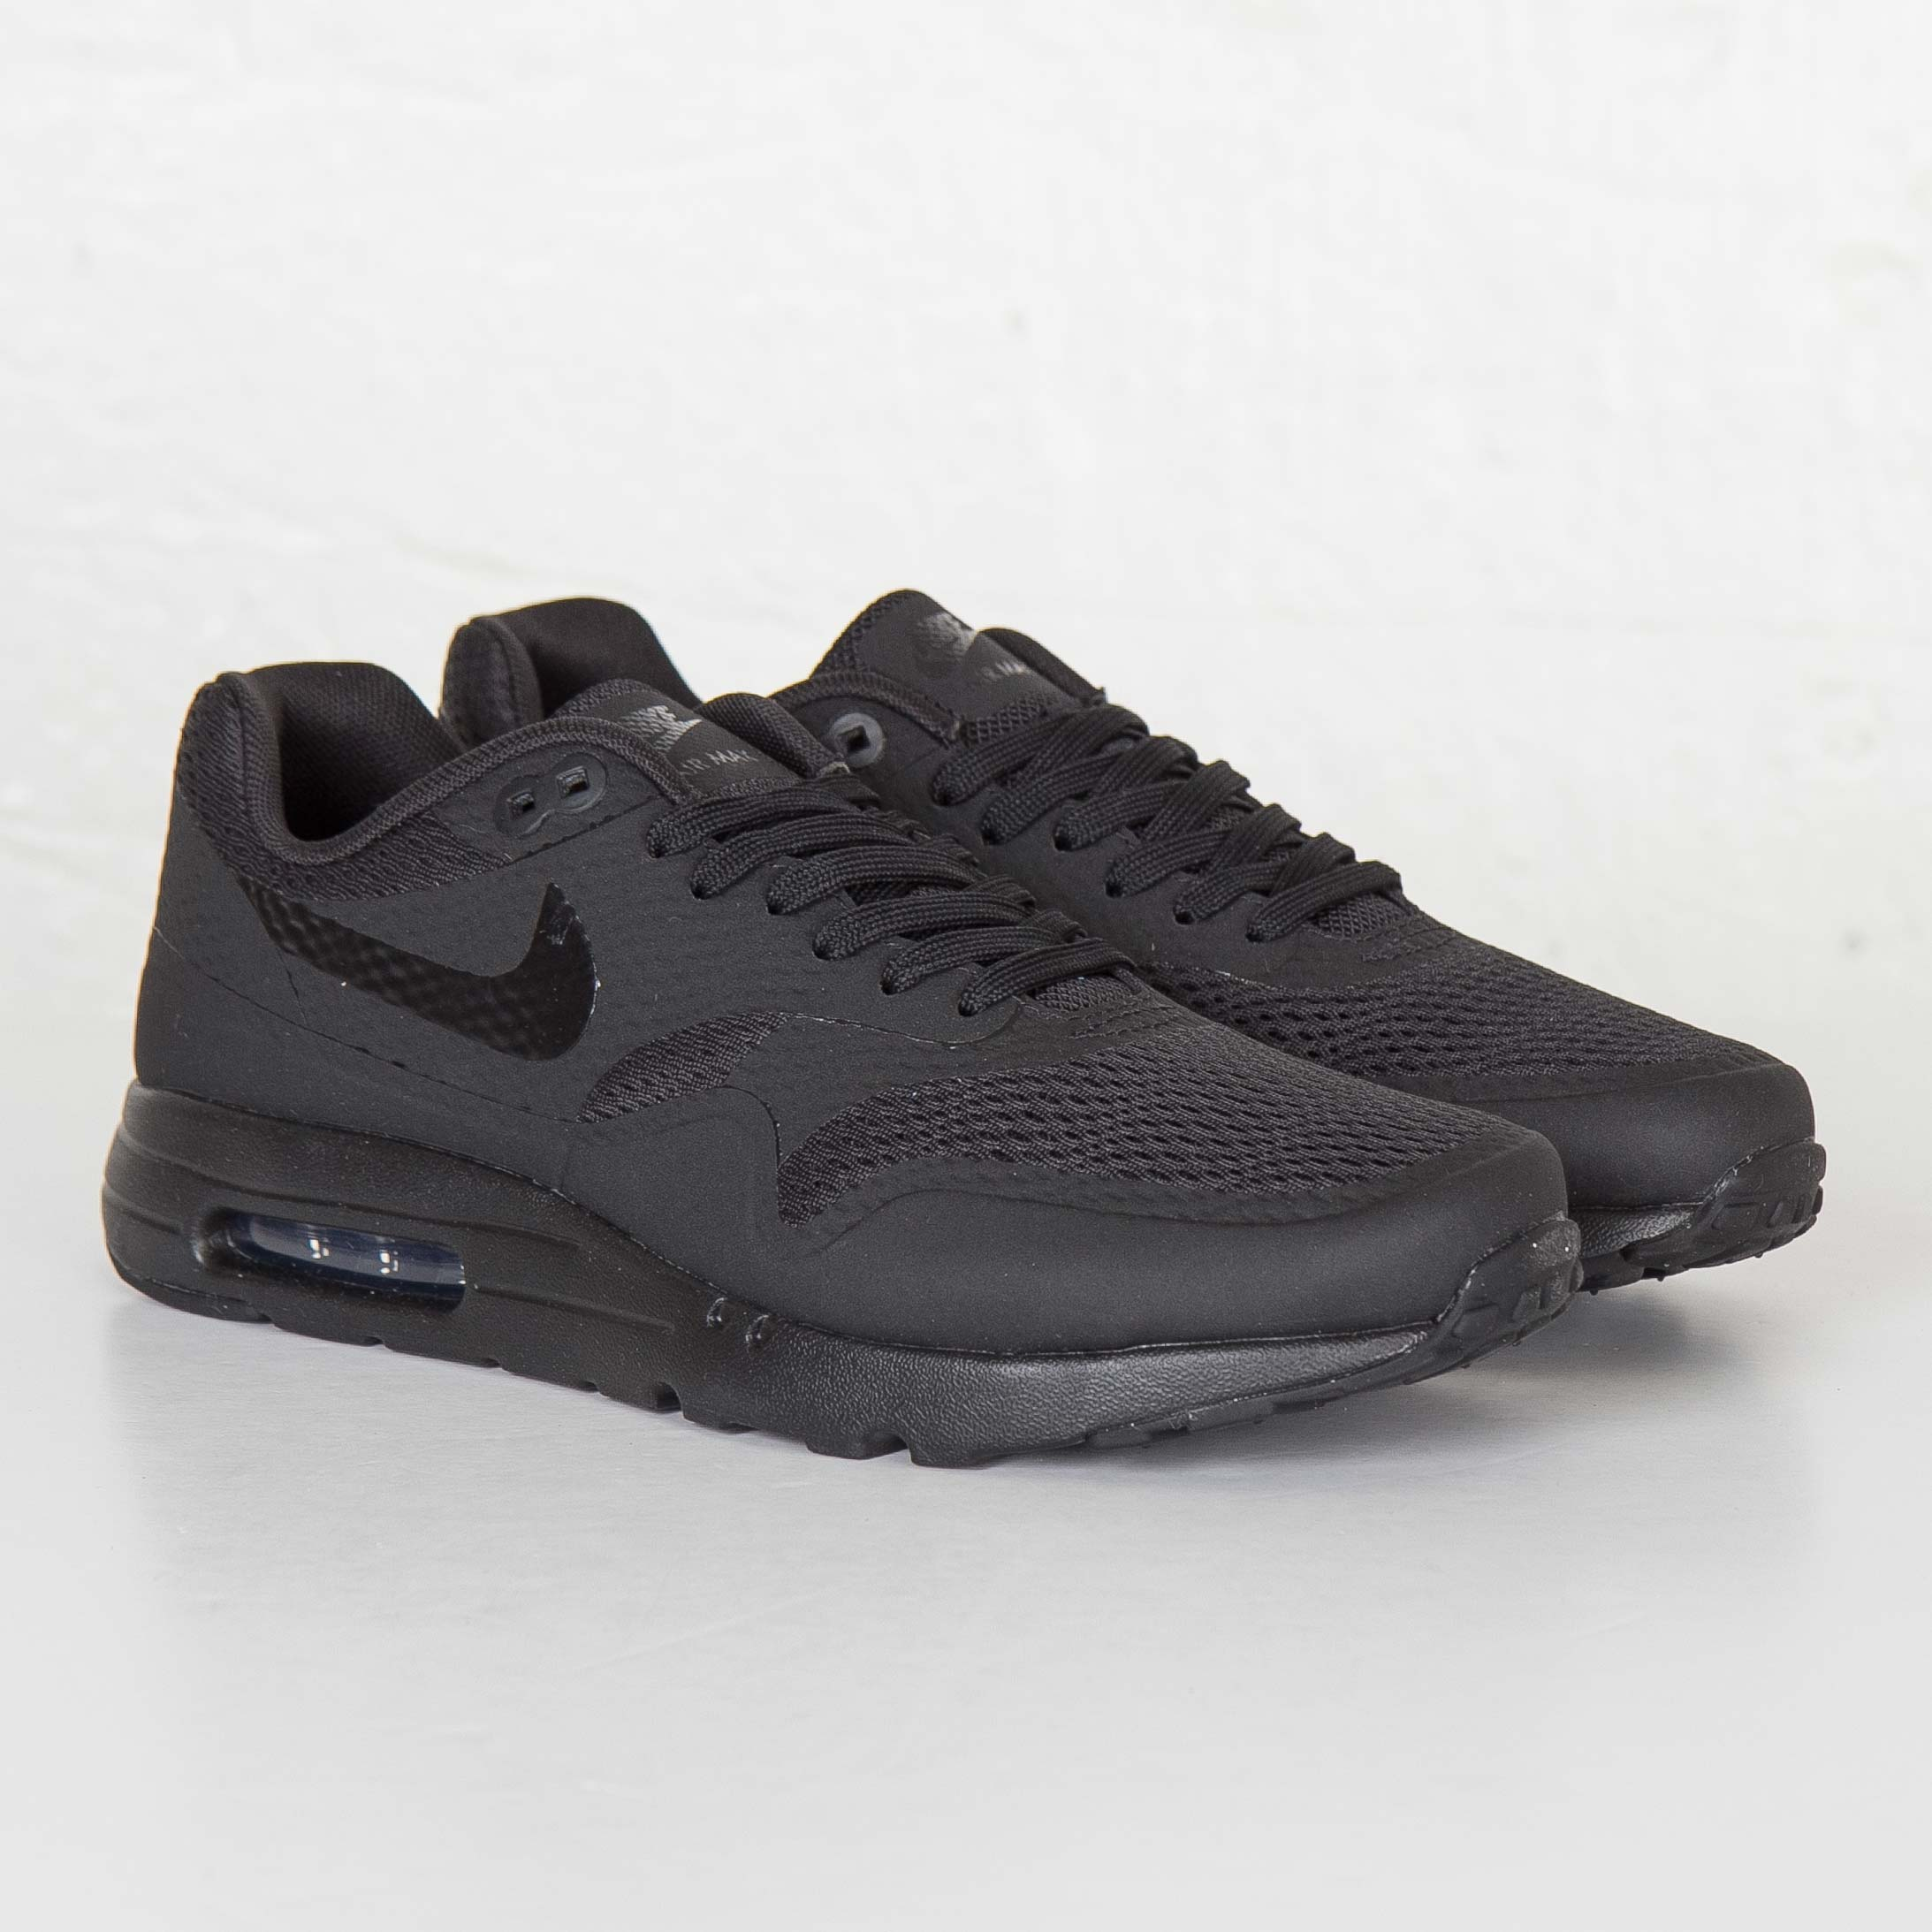 best website 1df8b 8827d Nike Air Max 1 Ultra Essential